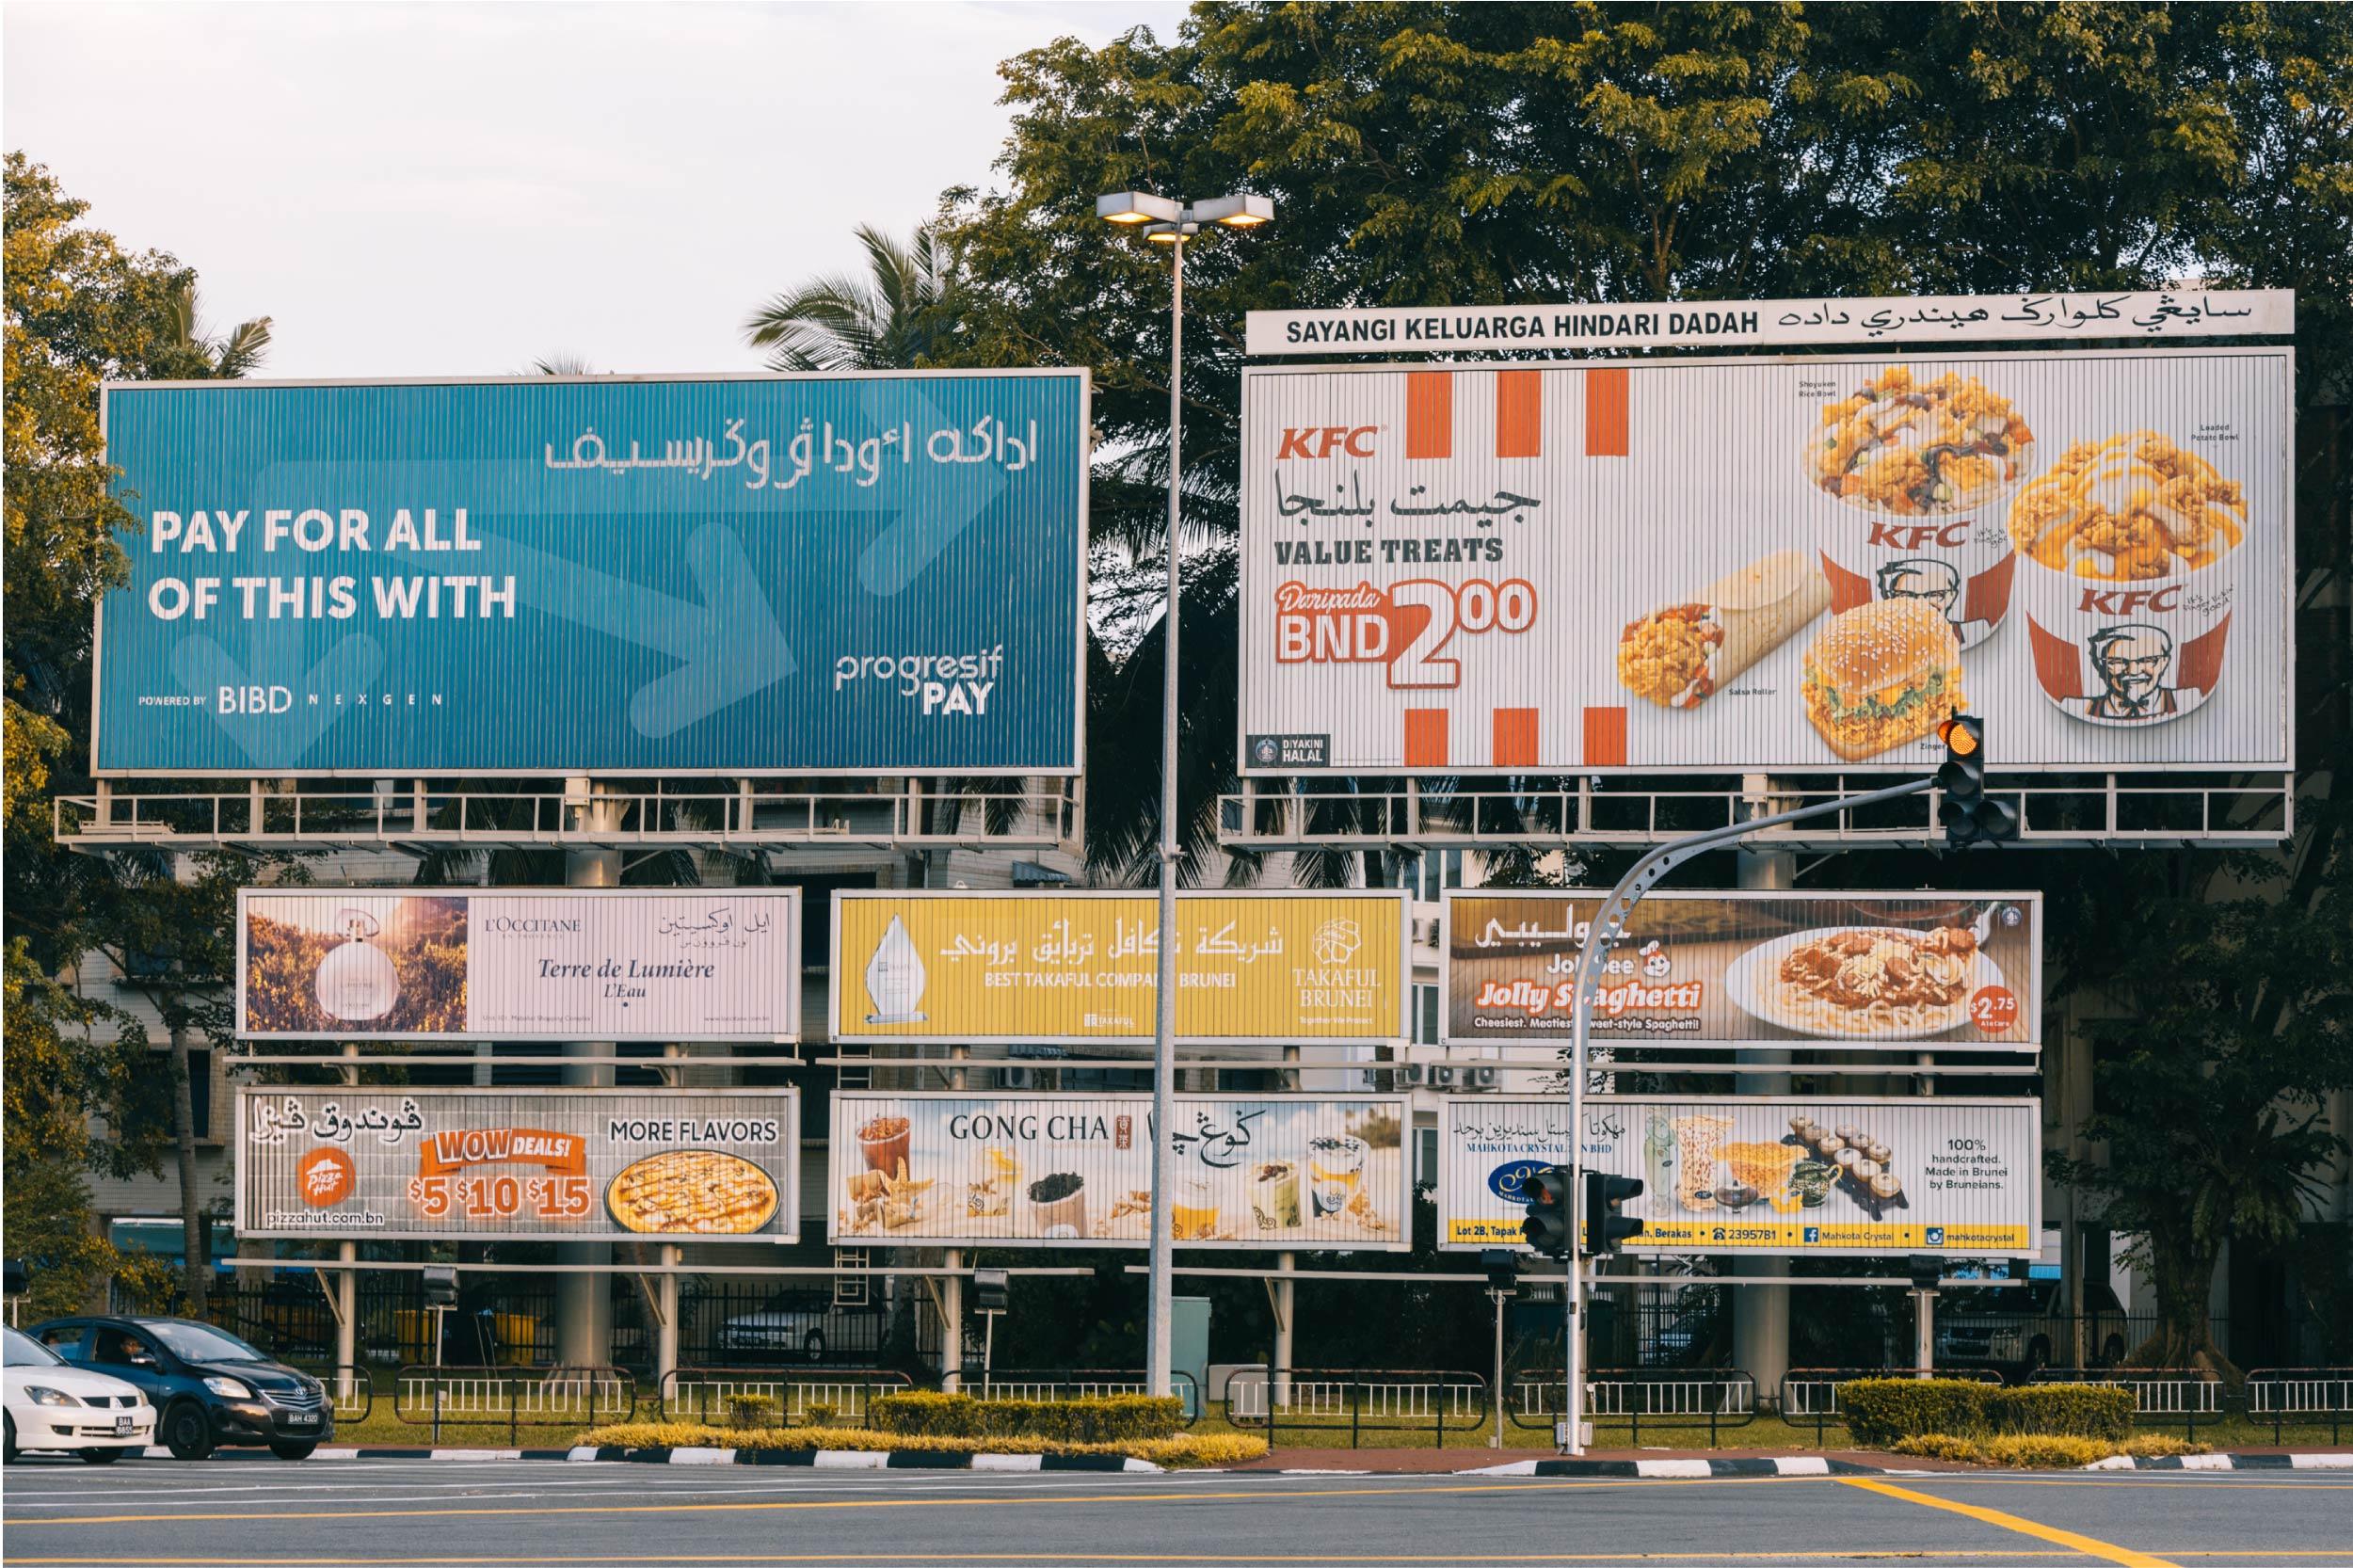 Progresif Pay_laptop - billboard 3.jpg